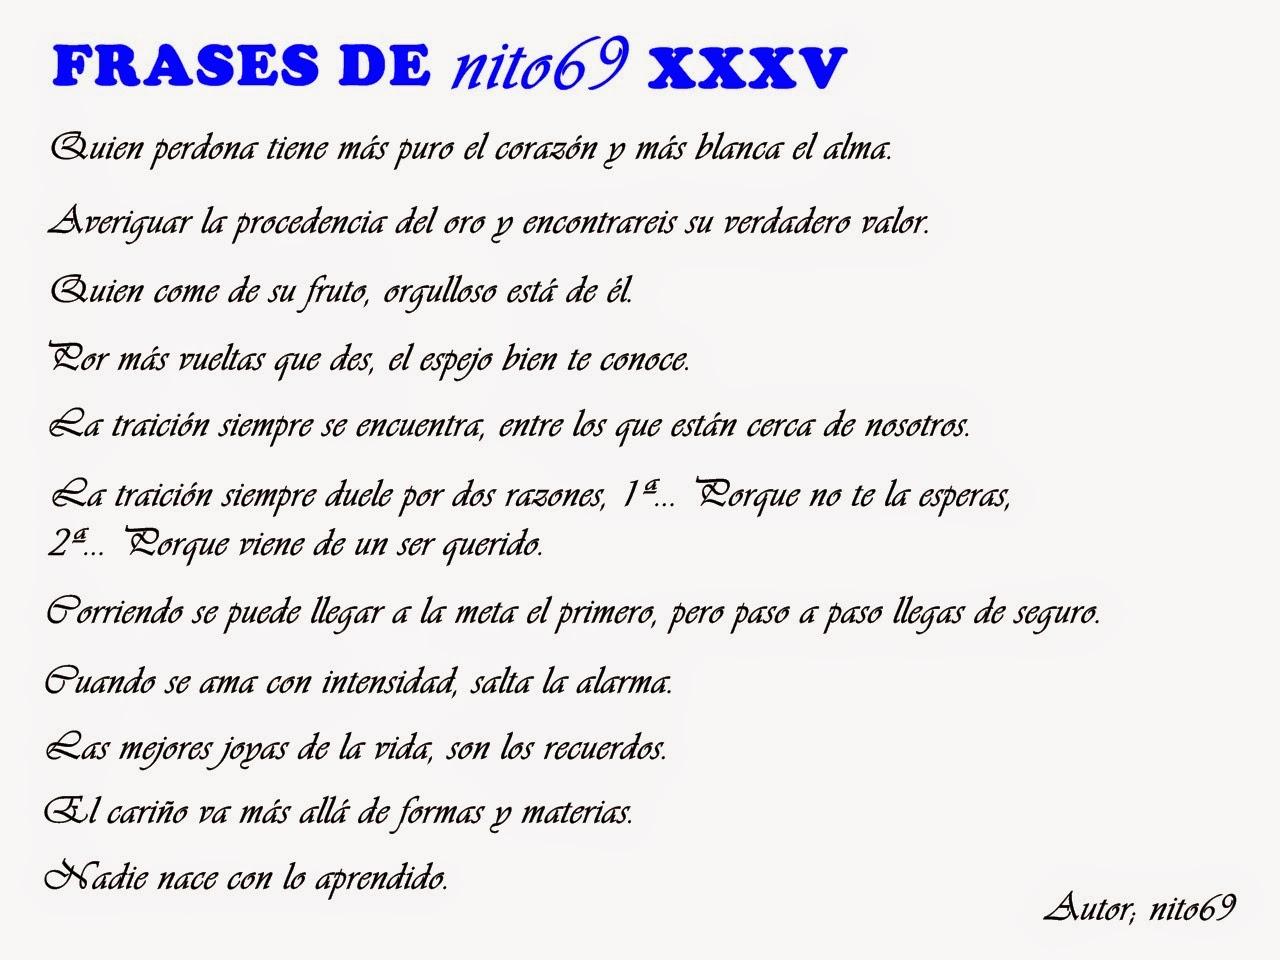 FRASES DE nito69 XXXV